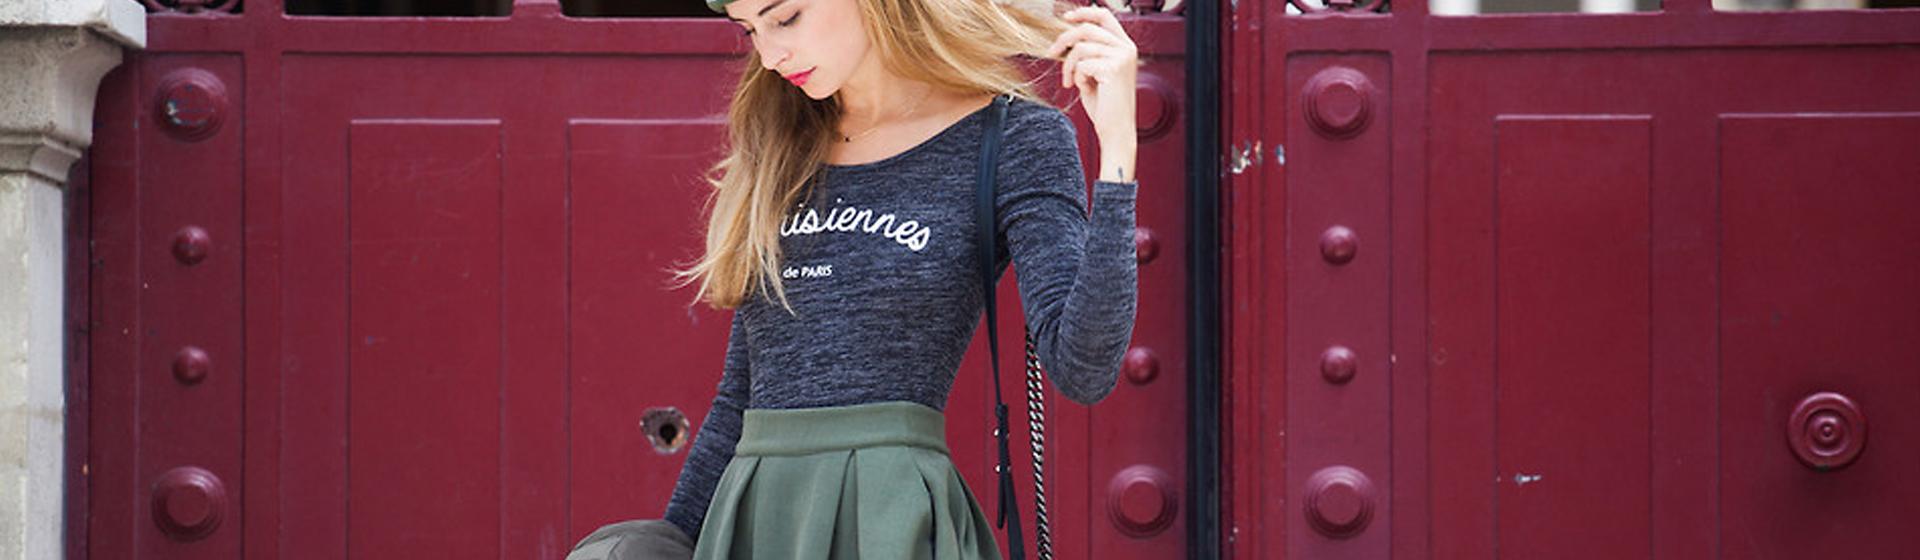 Voor Fashion Addicts!